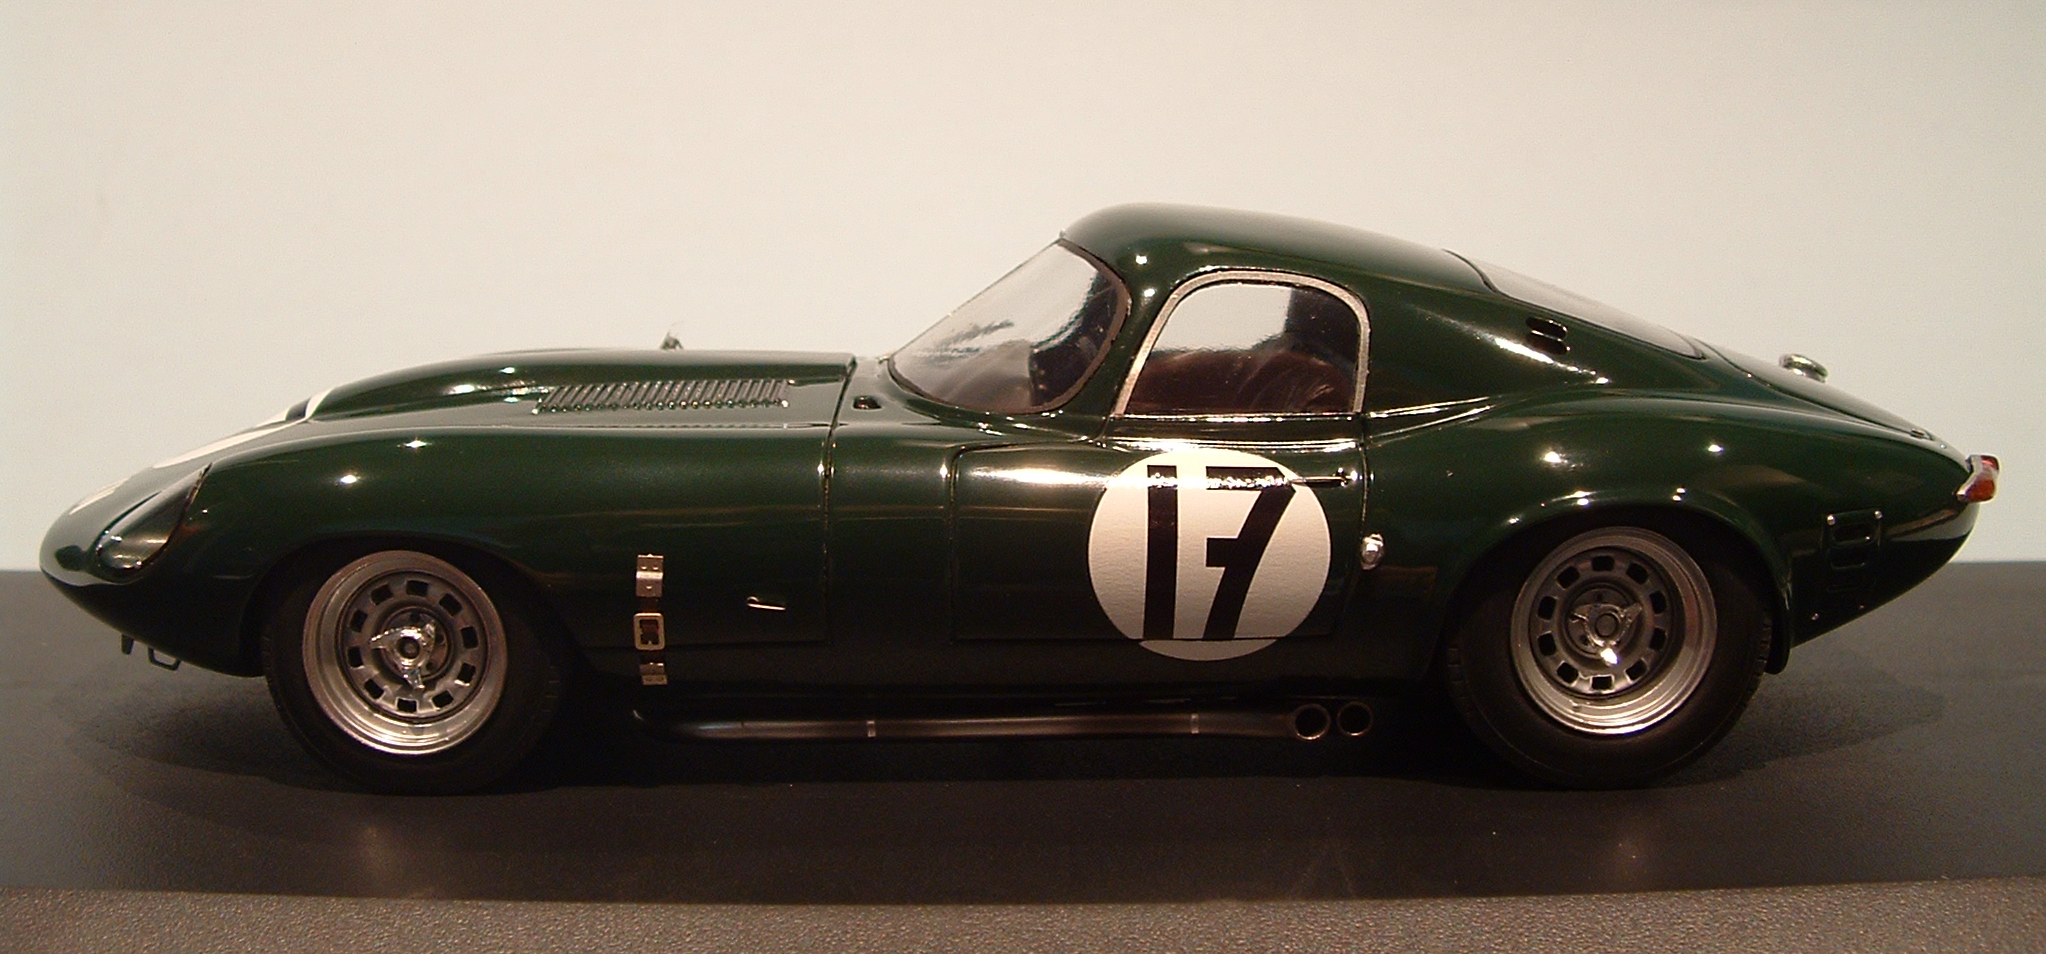 profil24 models montage jaguar type e le mans 1964 kit profil 24. Black Bedroom Furniture Sets. Home Design Ideas